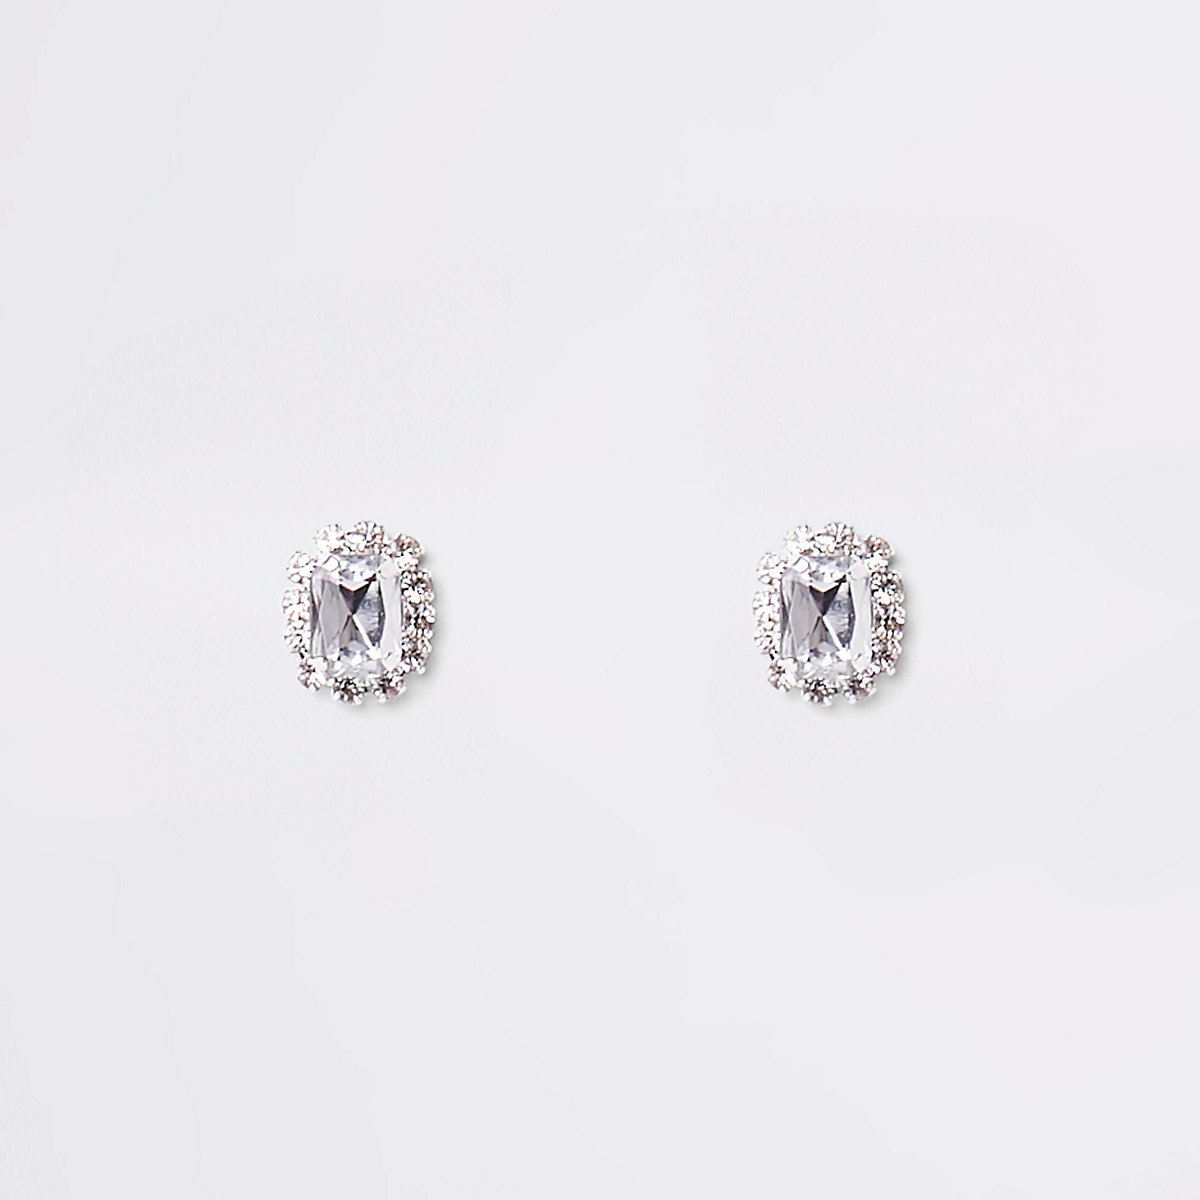 Silver tone rhinestone stone stud earrings